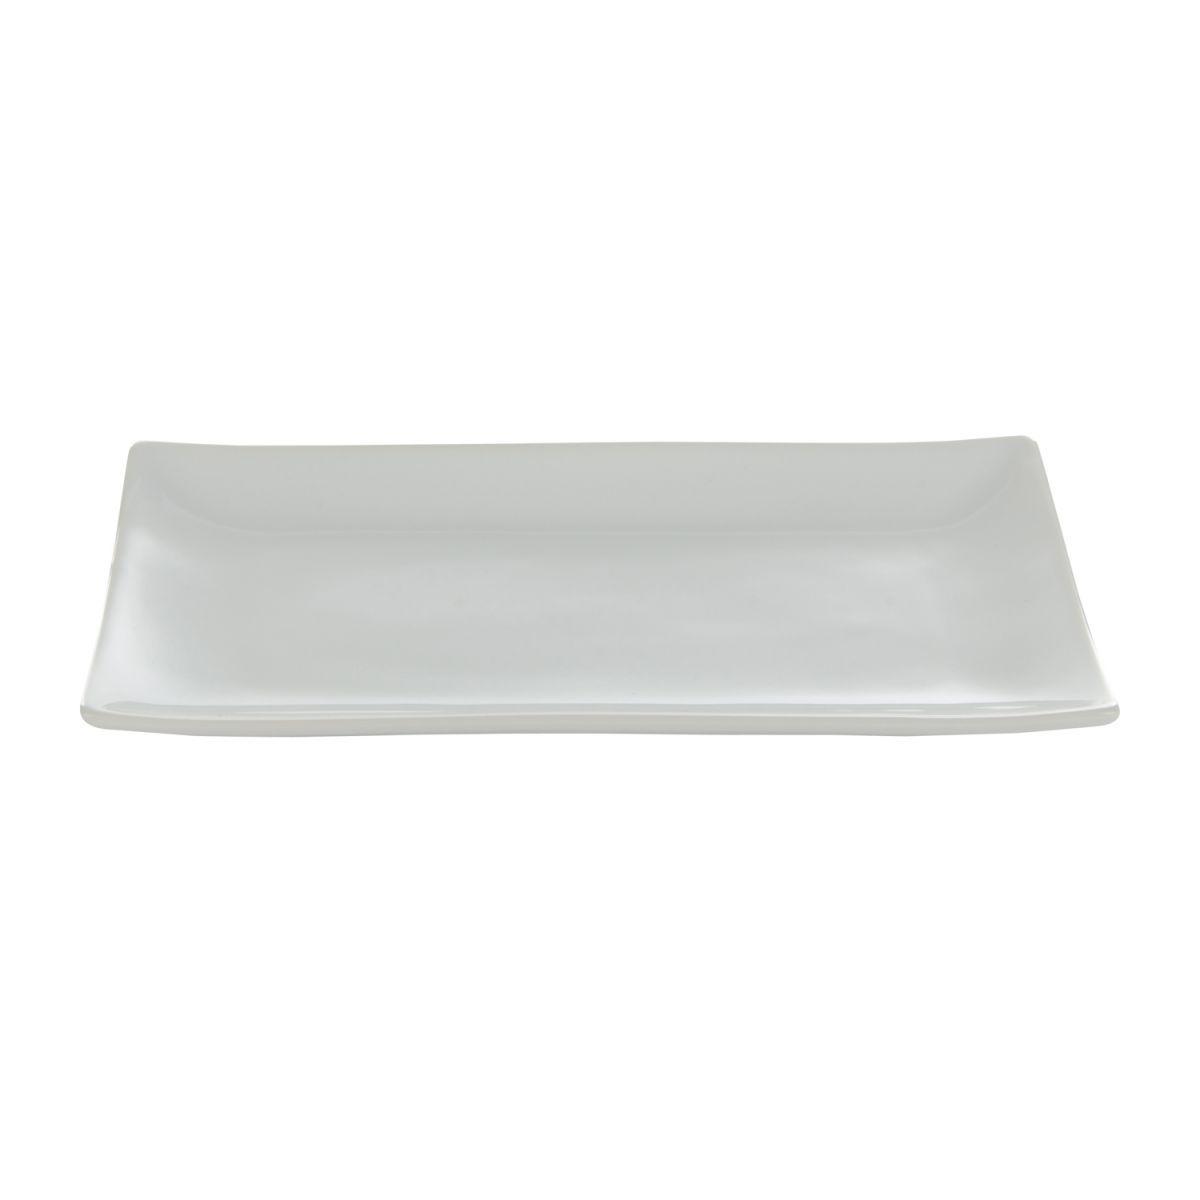 tray rectangular 28 x 15 cm box6